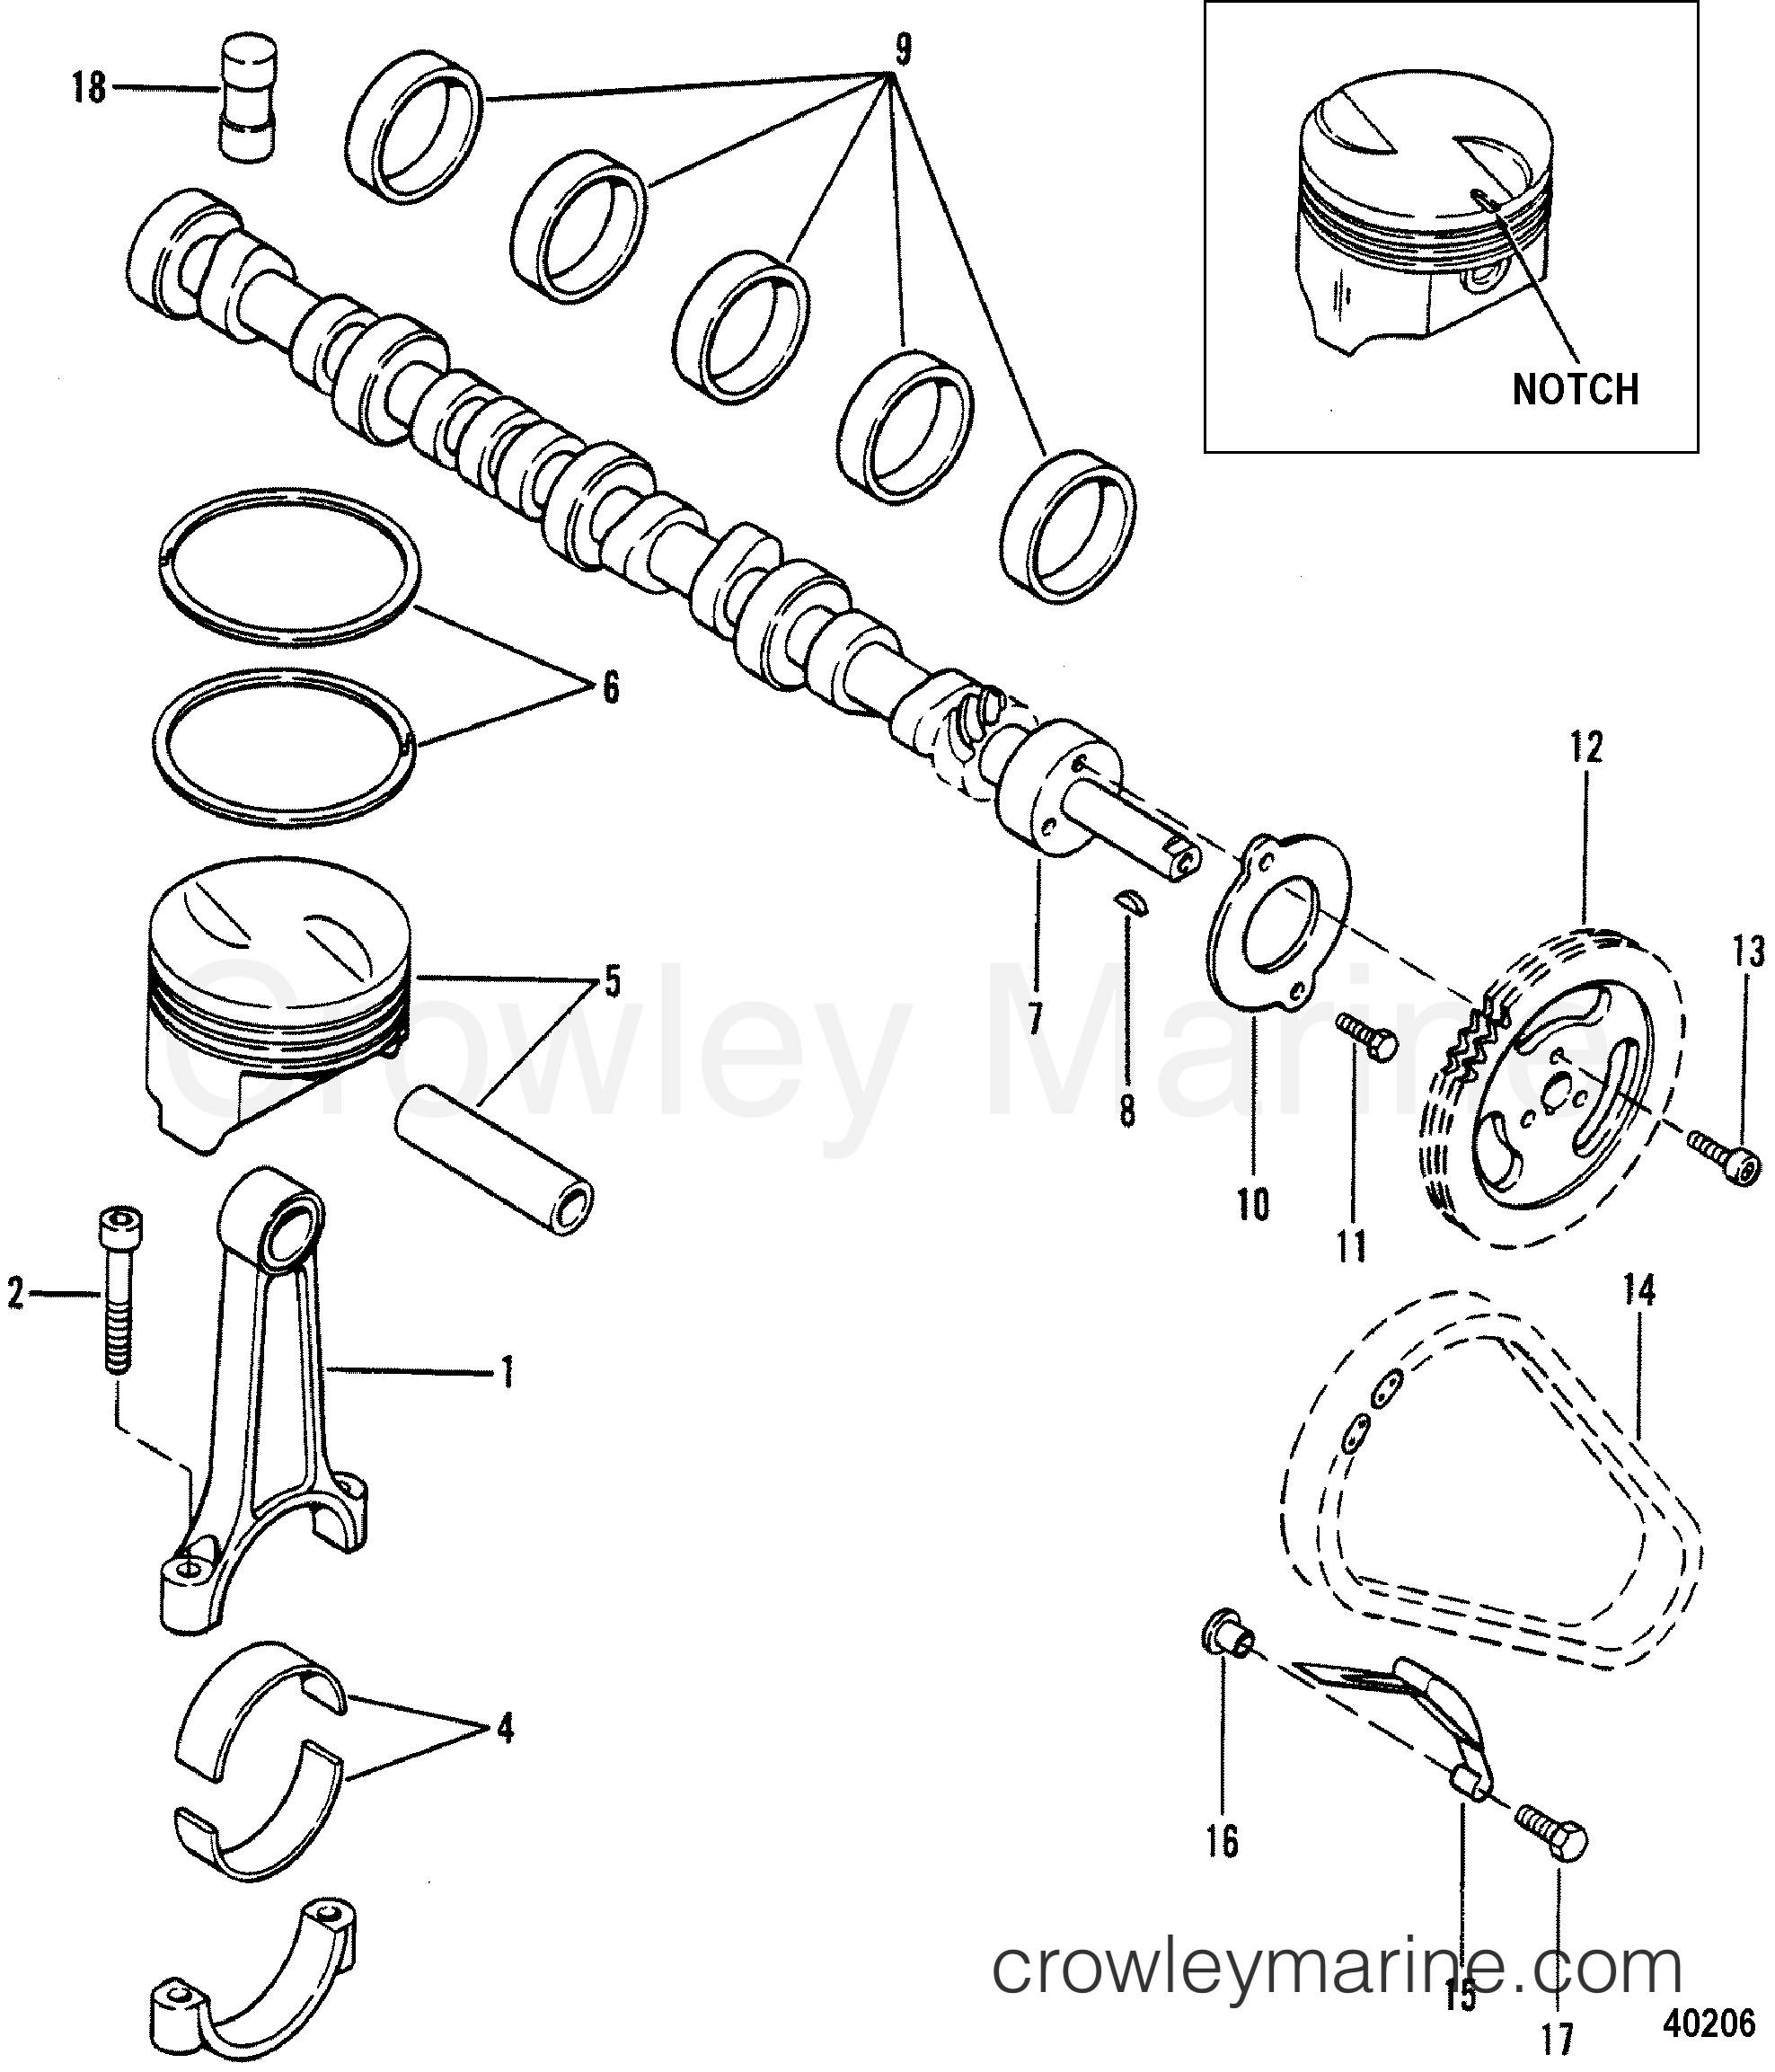 Mercruiser 470 Engine Diagram Camshaft and Piston 1983 Mercruiser 470 Of Mercruiser 470 Engine Diagram